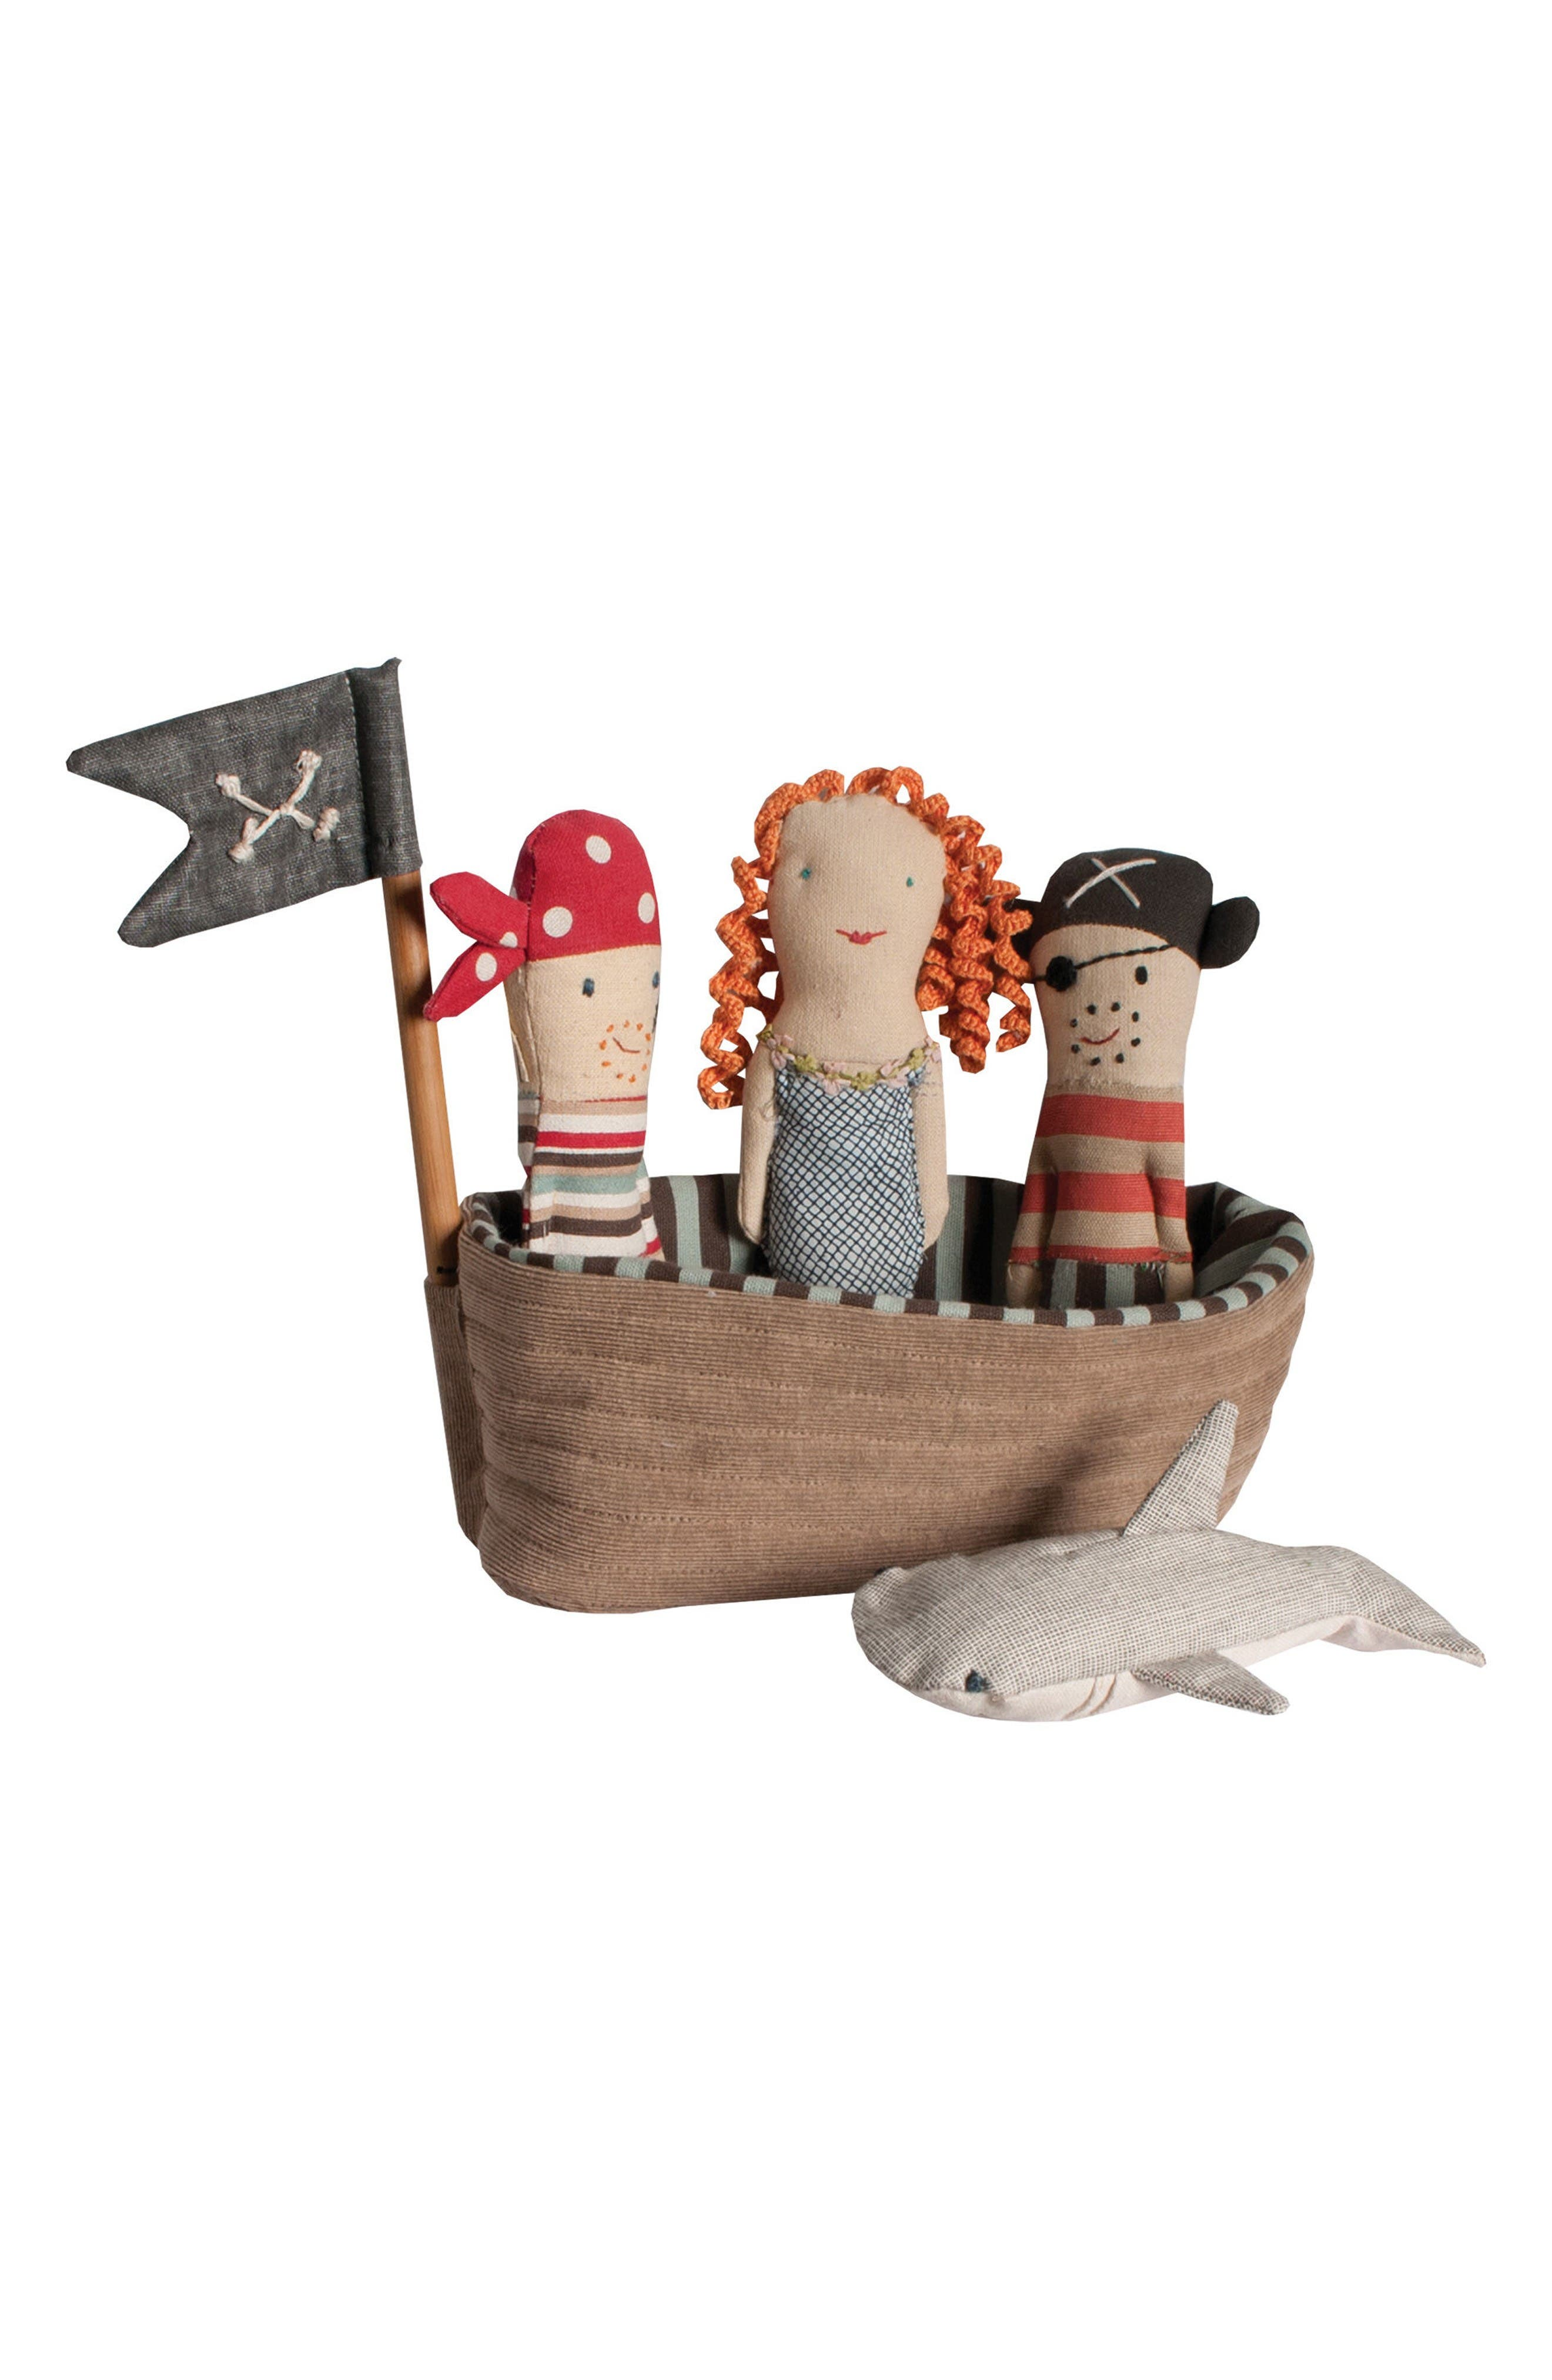 Maileg Pirate Ship Rattle 5-Piece Play Set